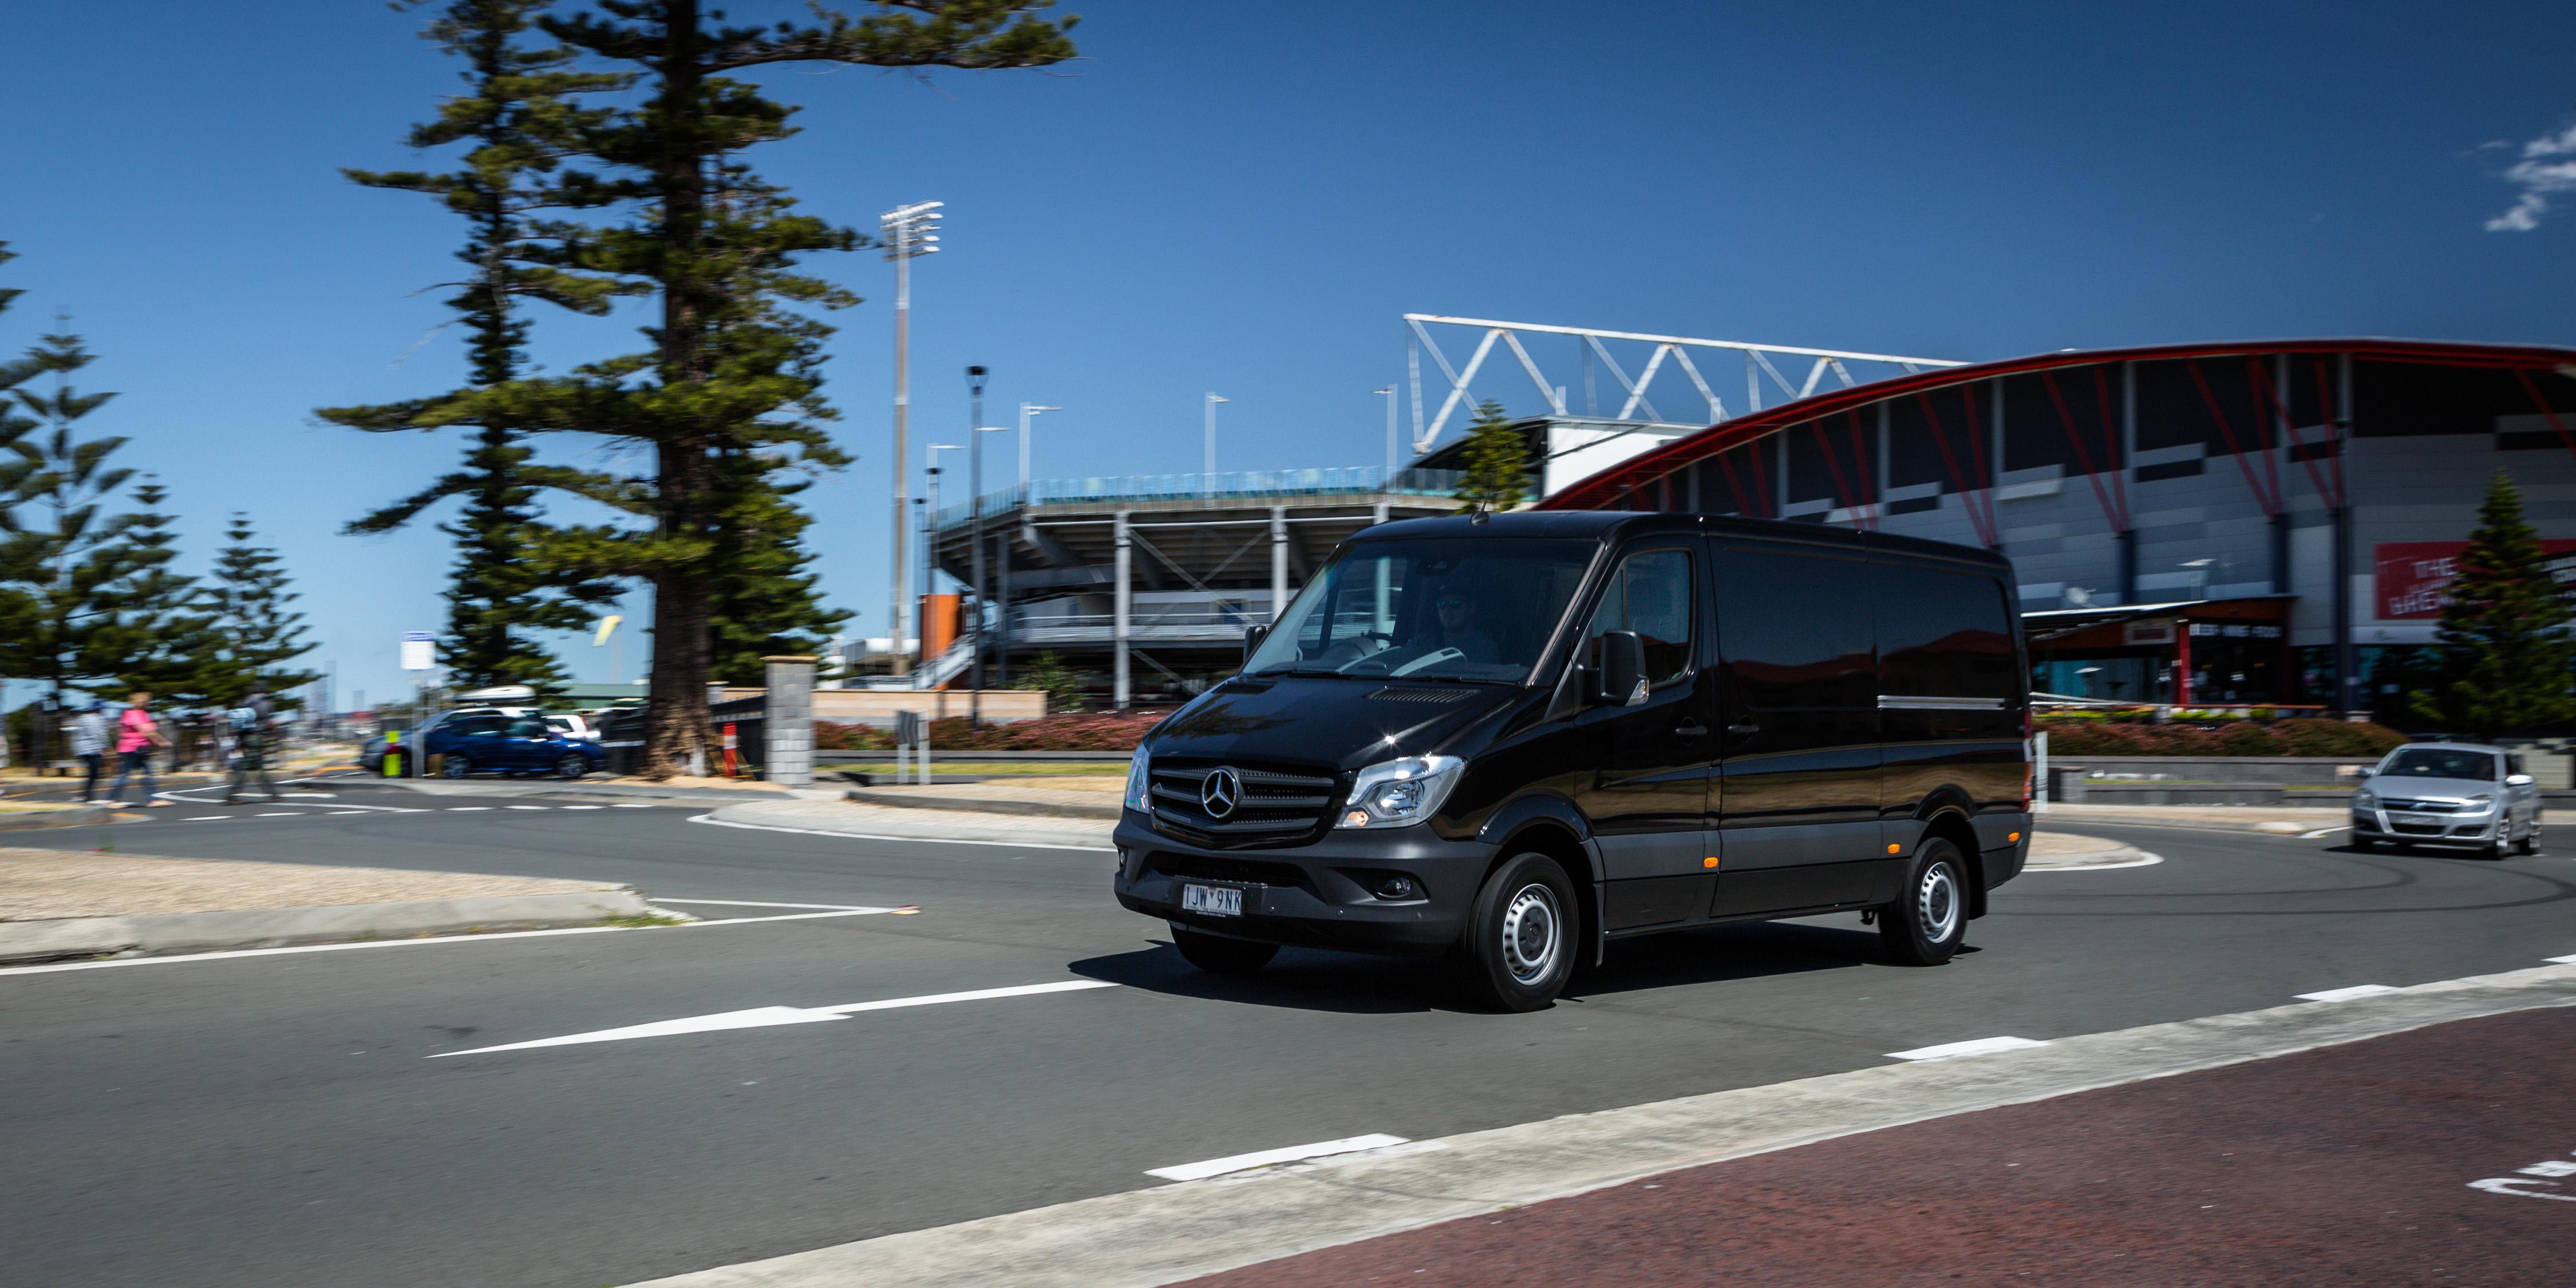 2017 Mercedes-Benz Sprinter 316 CDI MWB review | CarAdvice